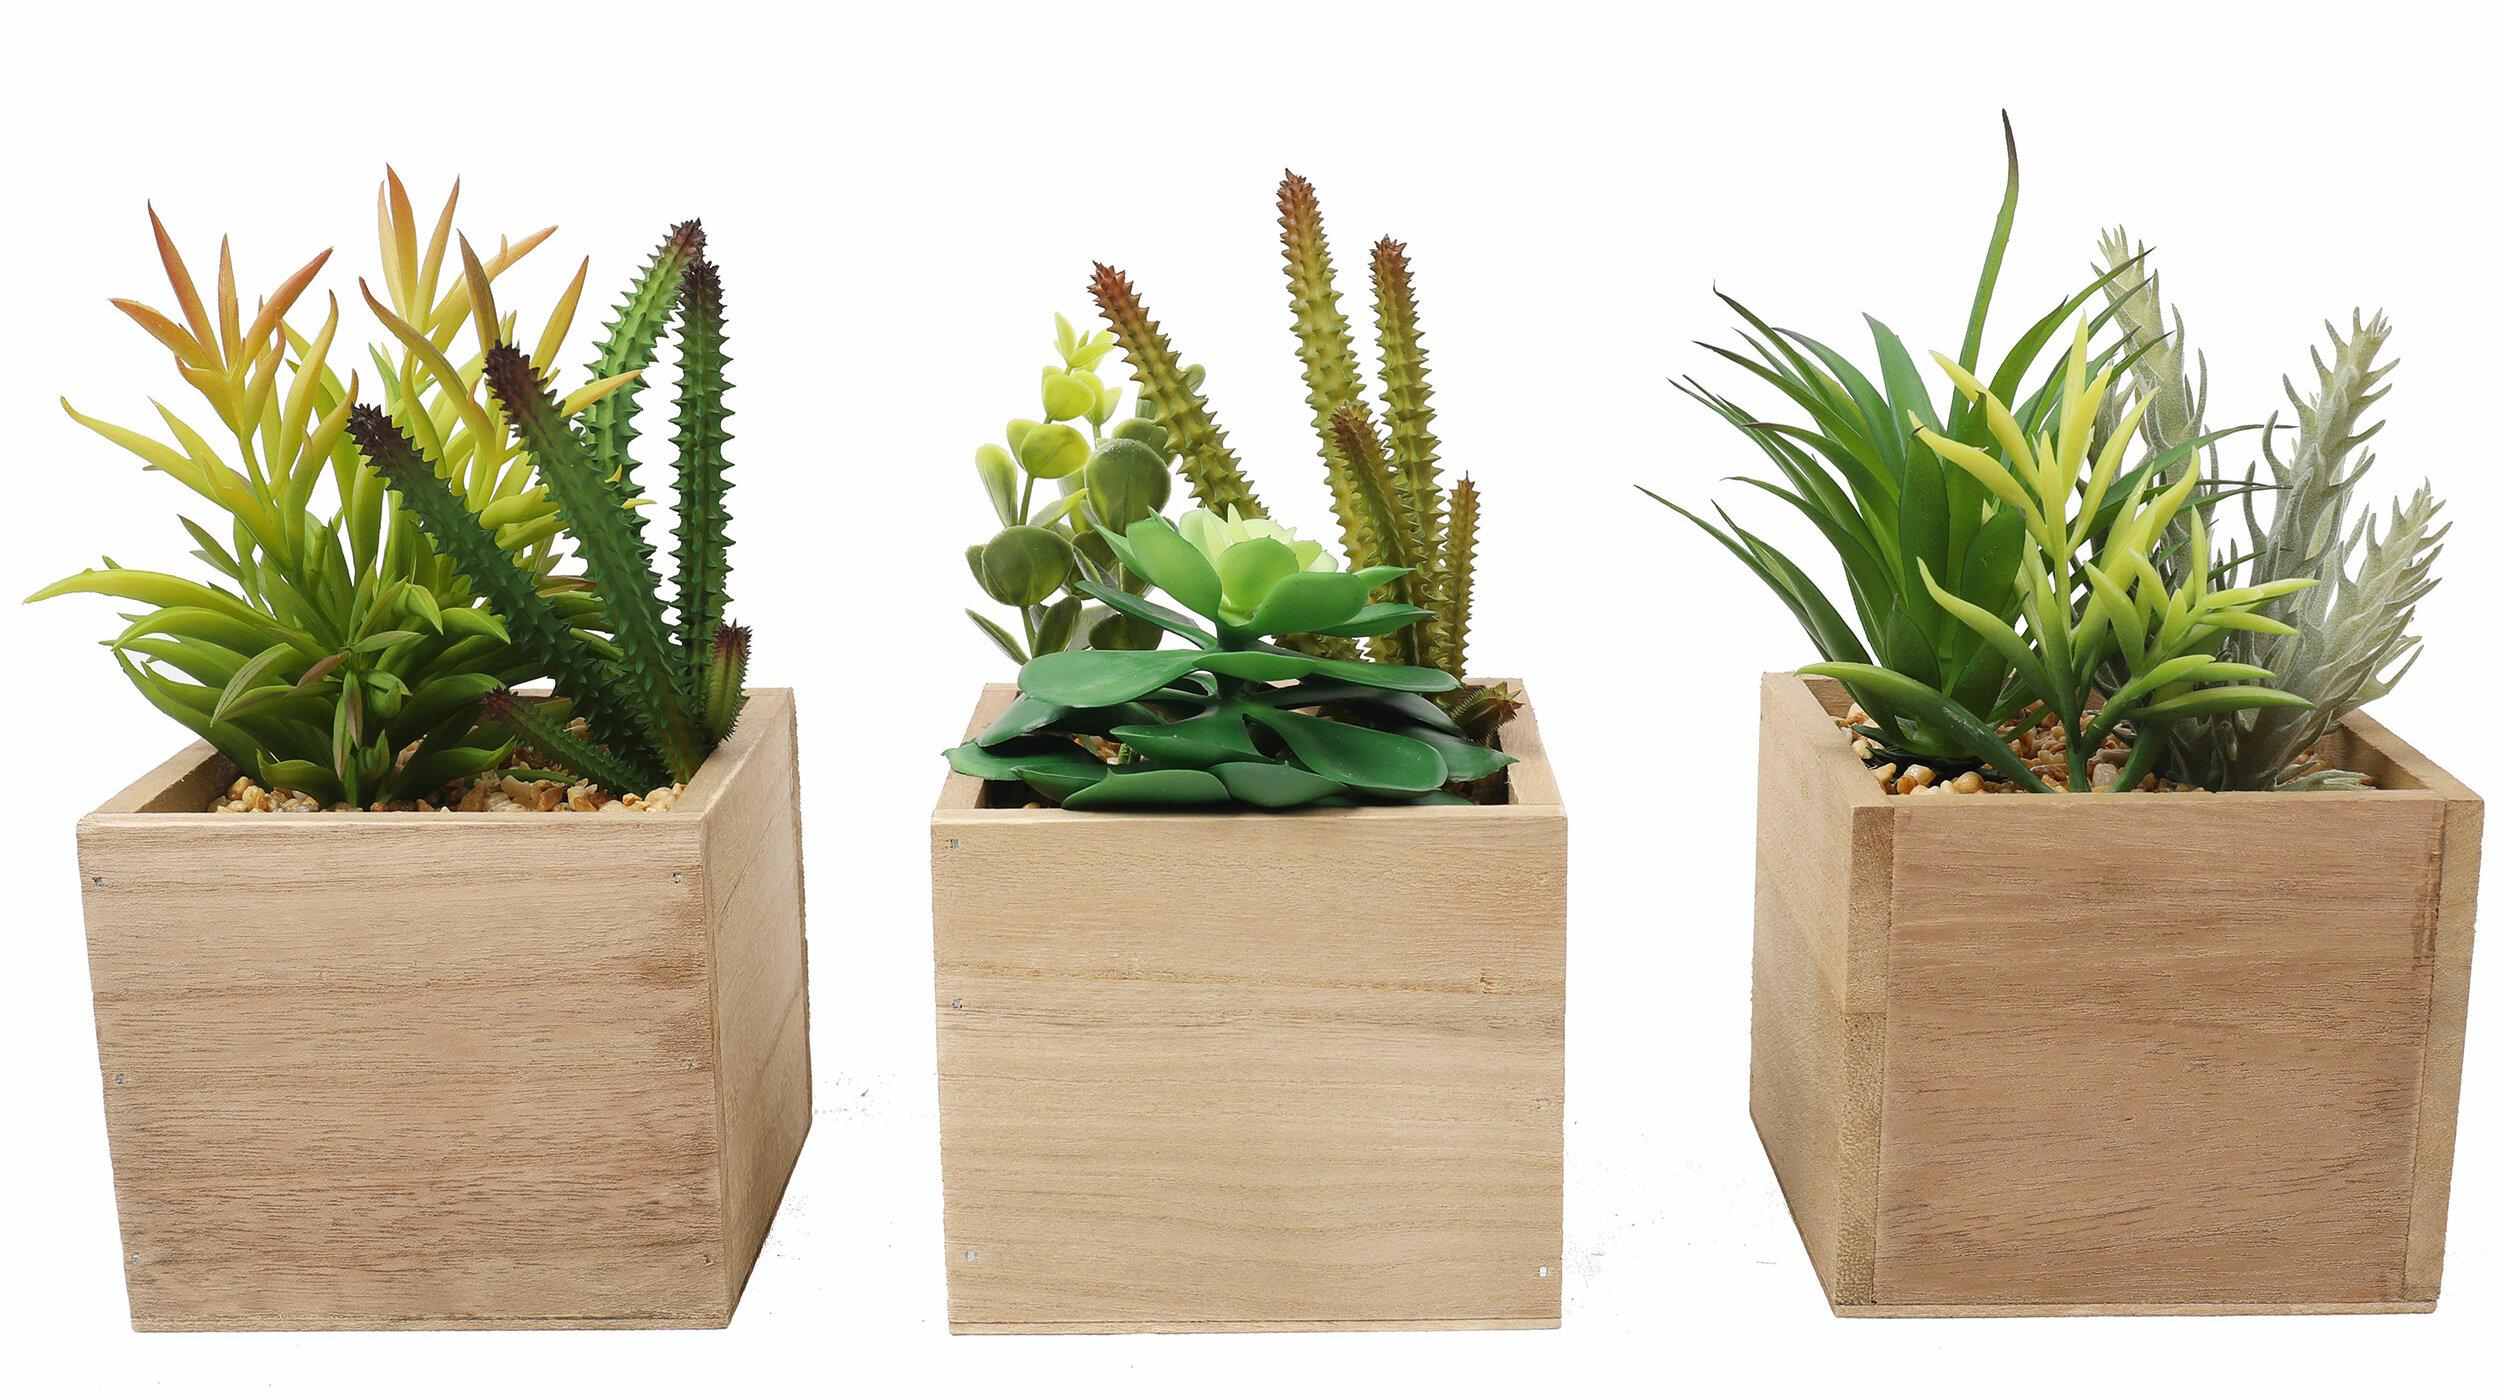 Union Rustic 3 Artificial Assorted Cactus Succulent In Pot Set Reviews Wayfair